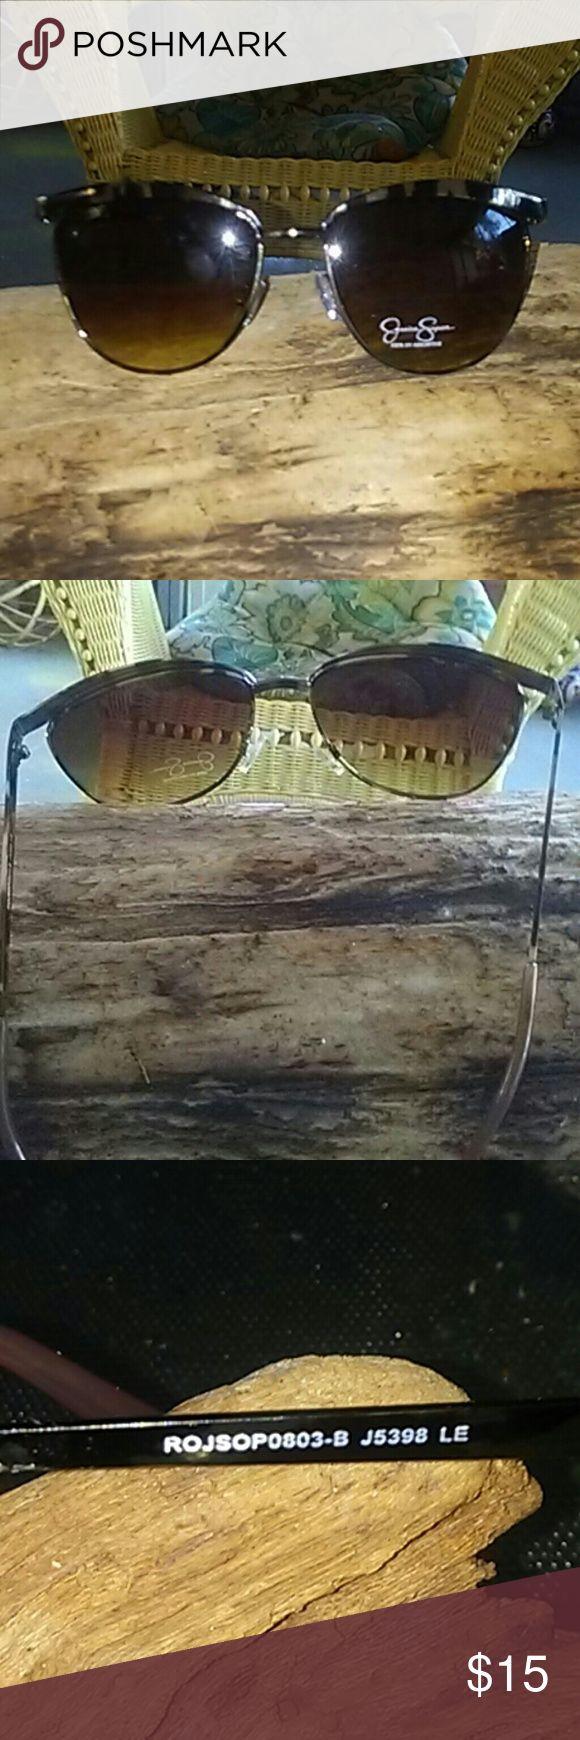 Jessica Simpson retro sunglasses Perfect condition Brown lens tortoise shell rims Jessica Simpson  Accessories Sunglasses